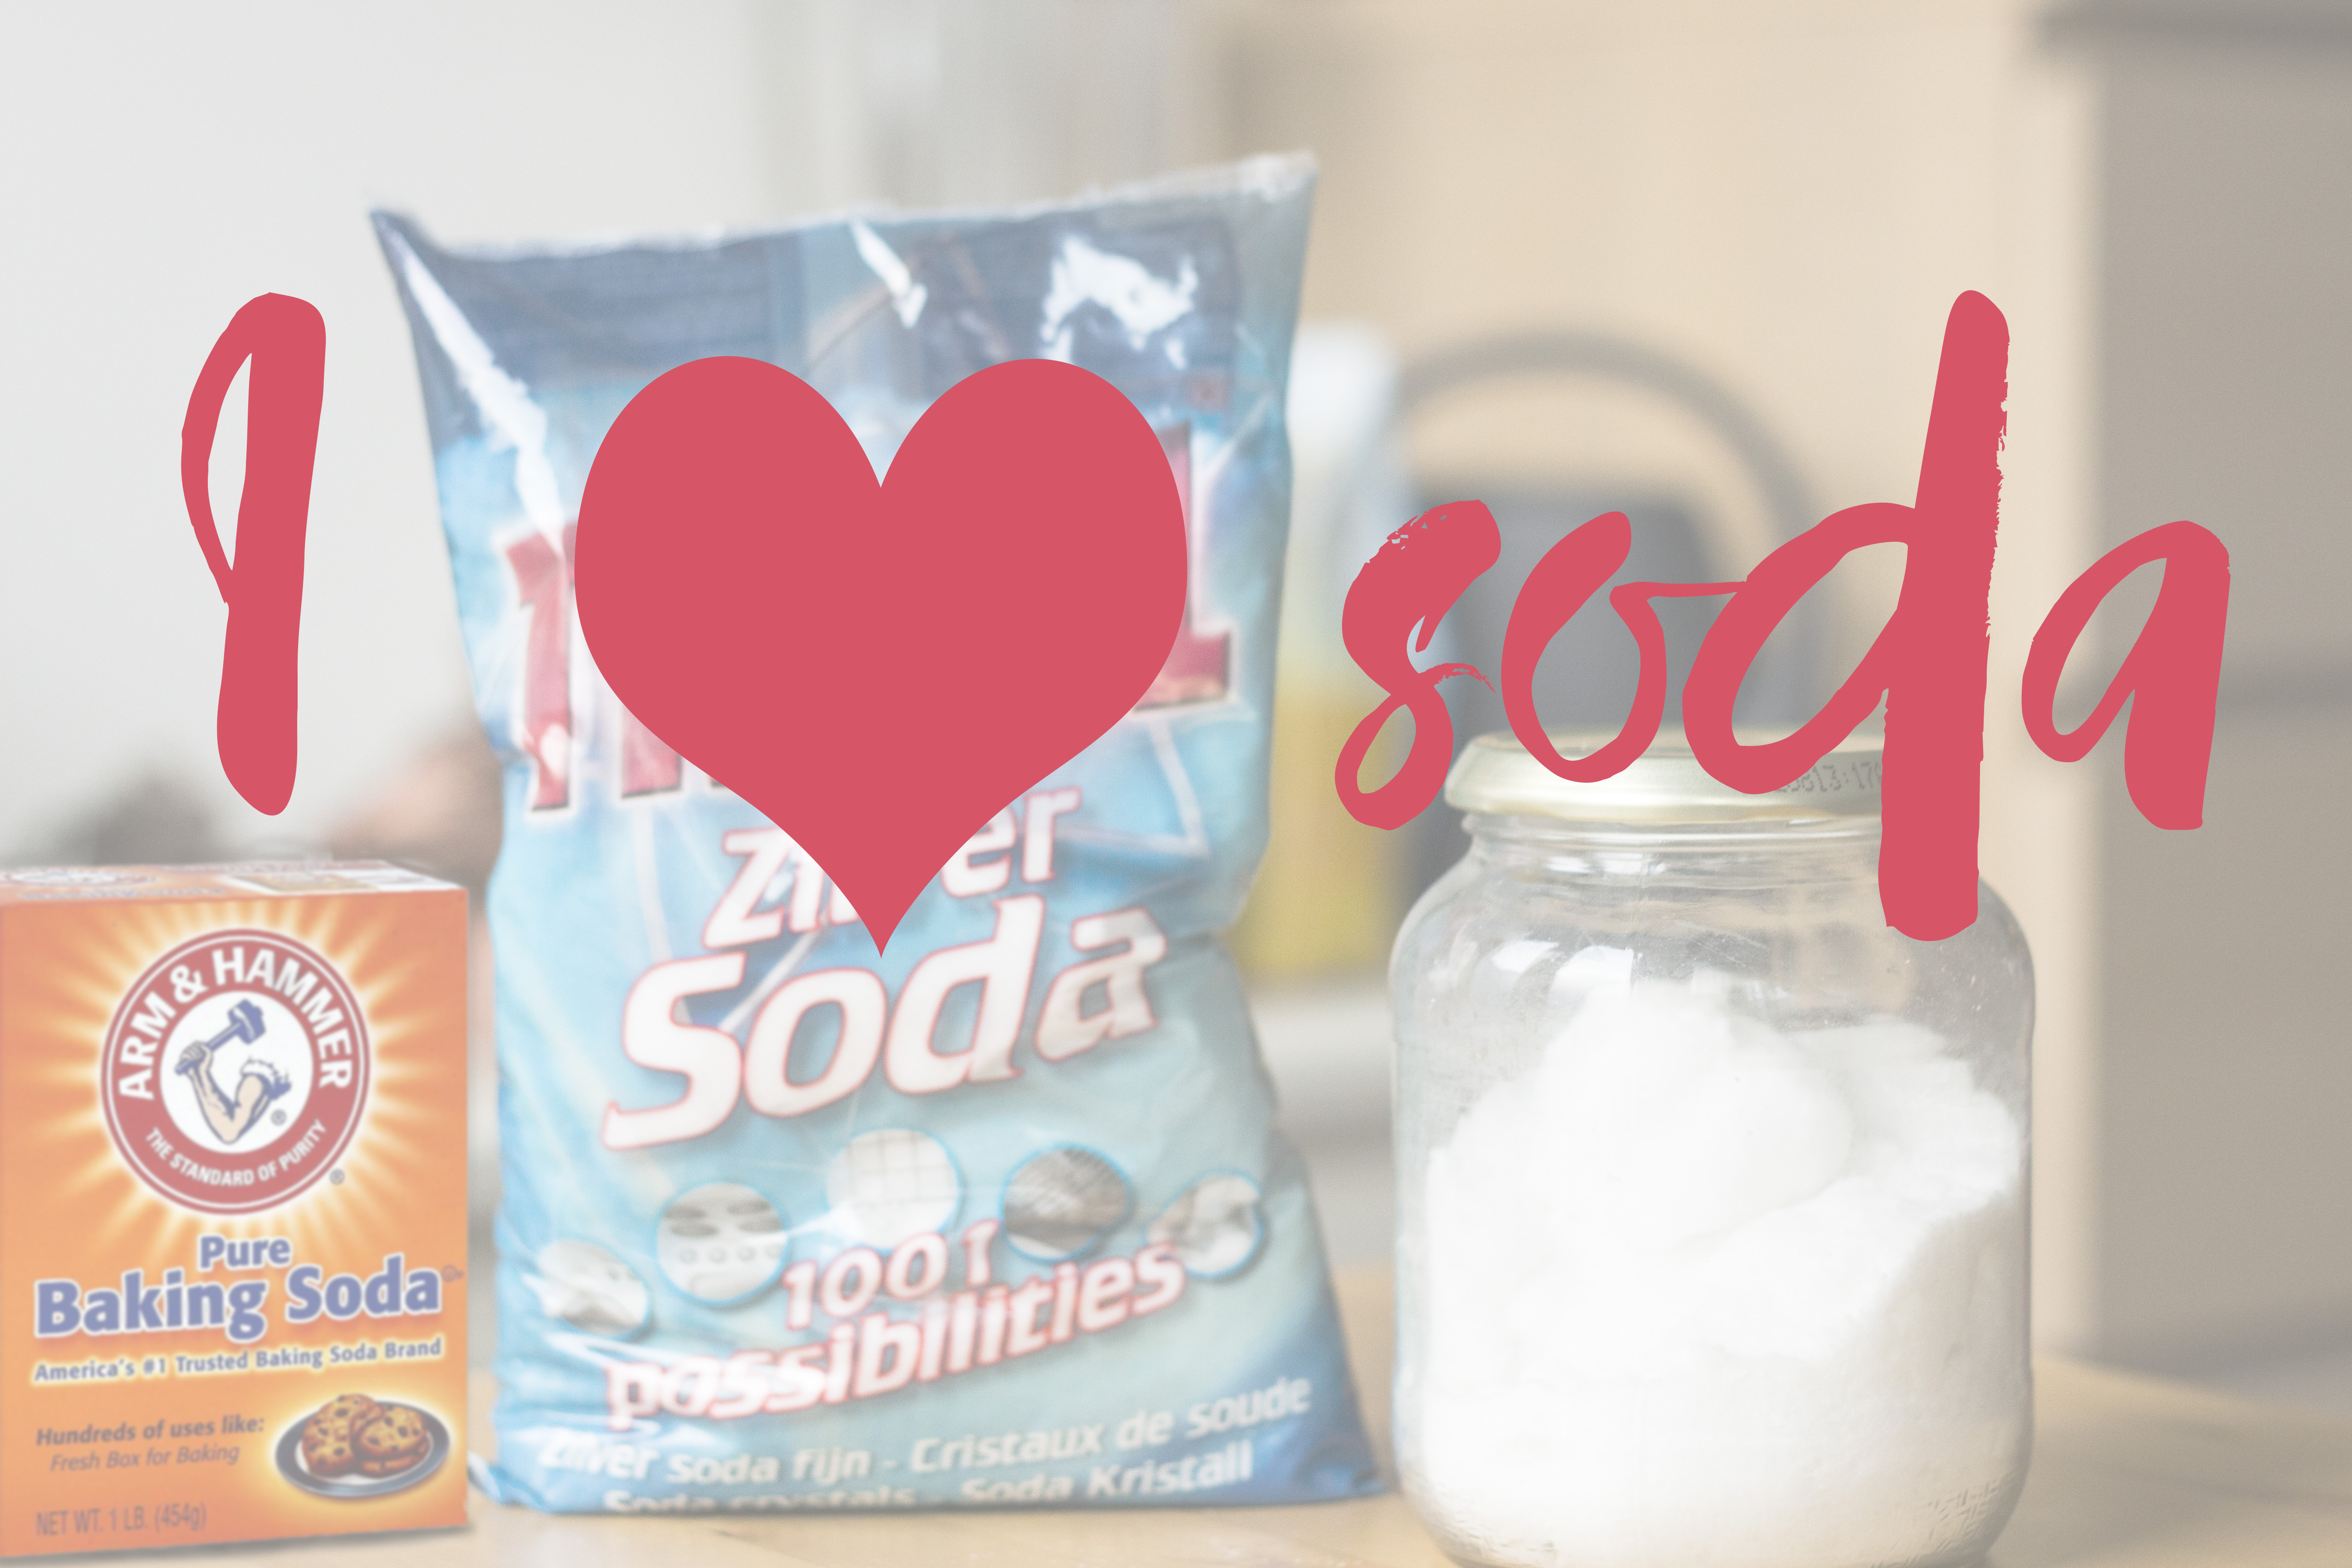 I love soda - debbieschrijft.nl